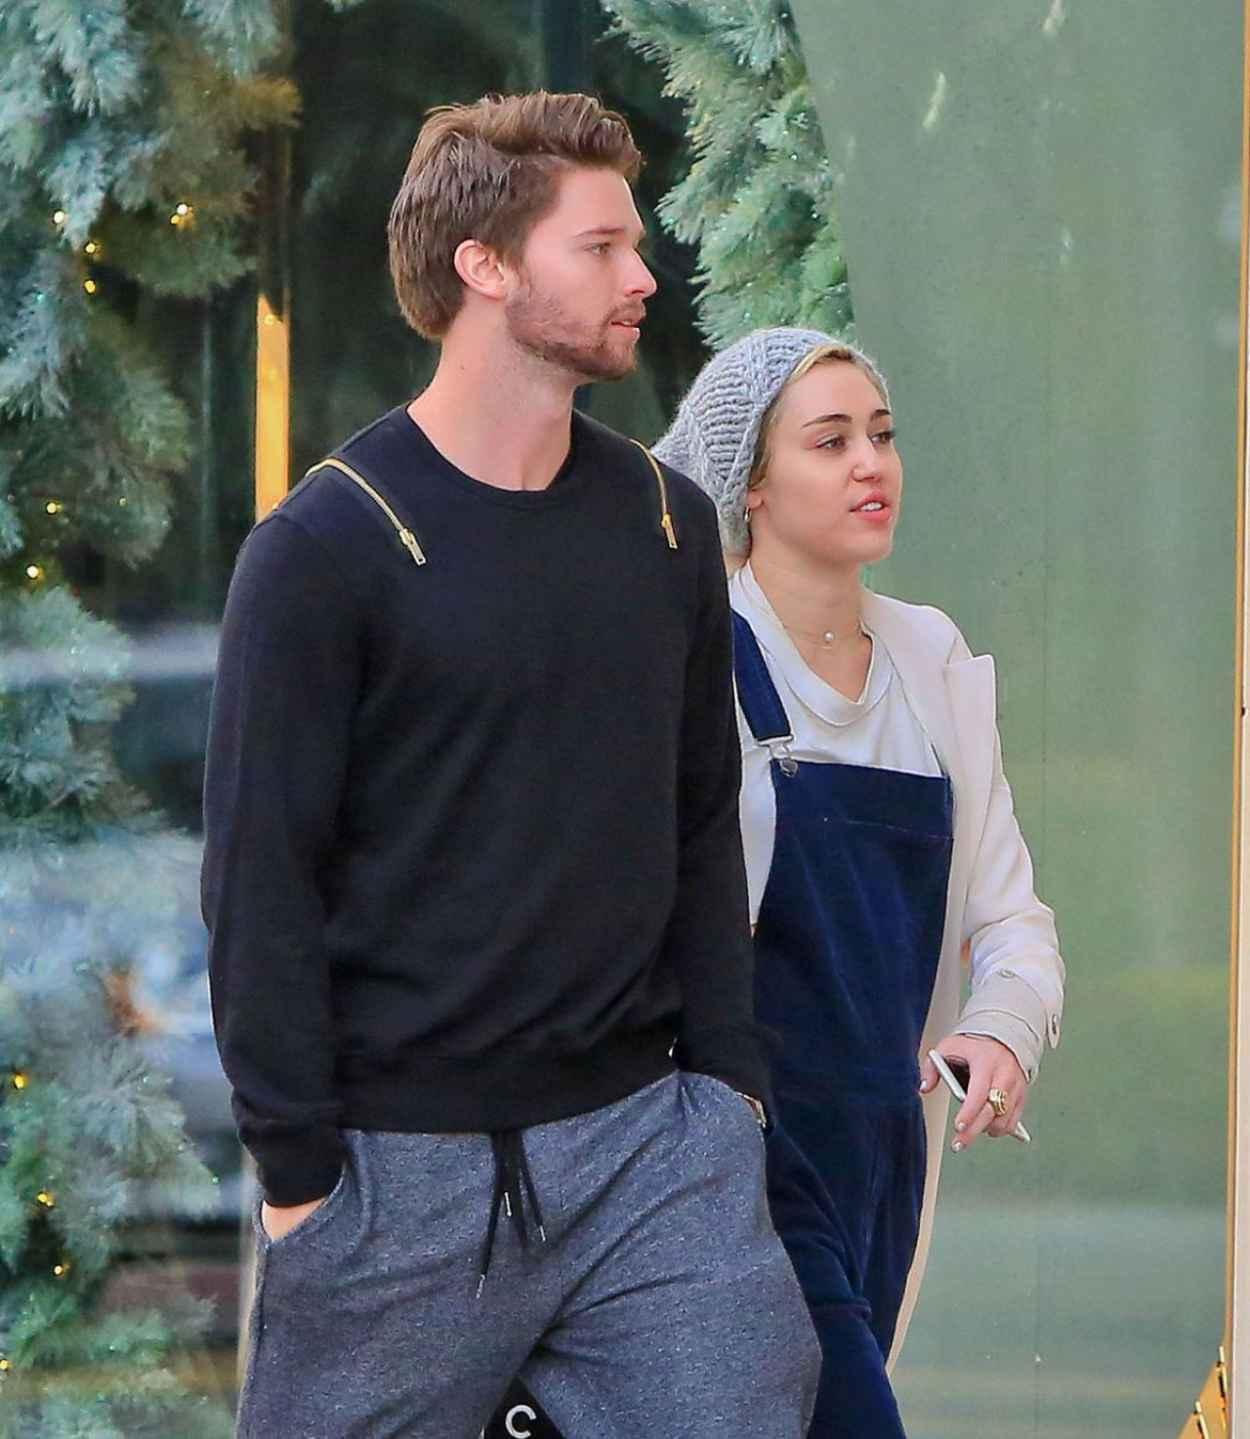 Miley Cyrus With New Boyfriend Patrick Schwarzenegger ...